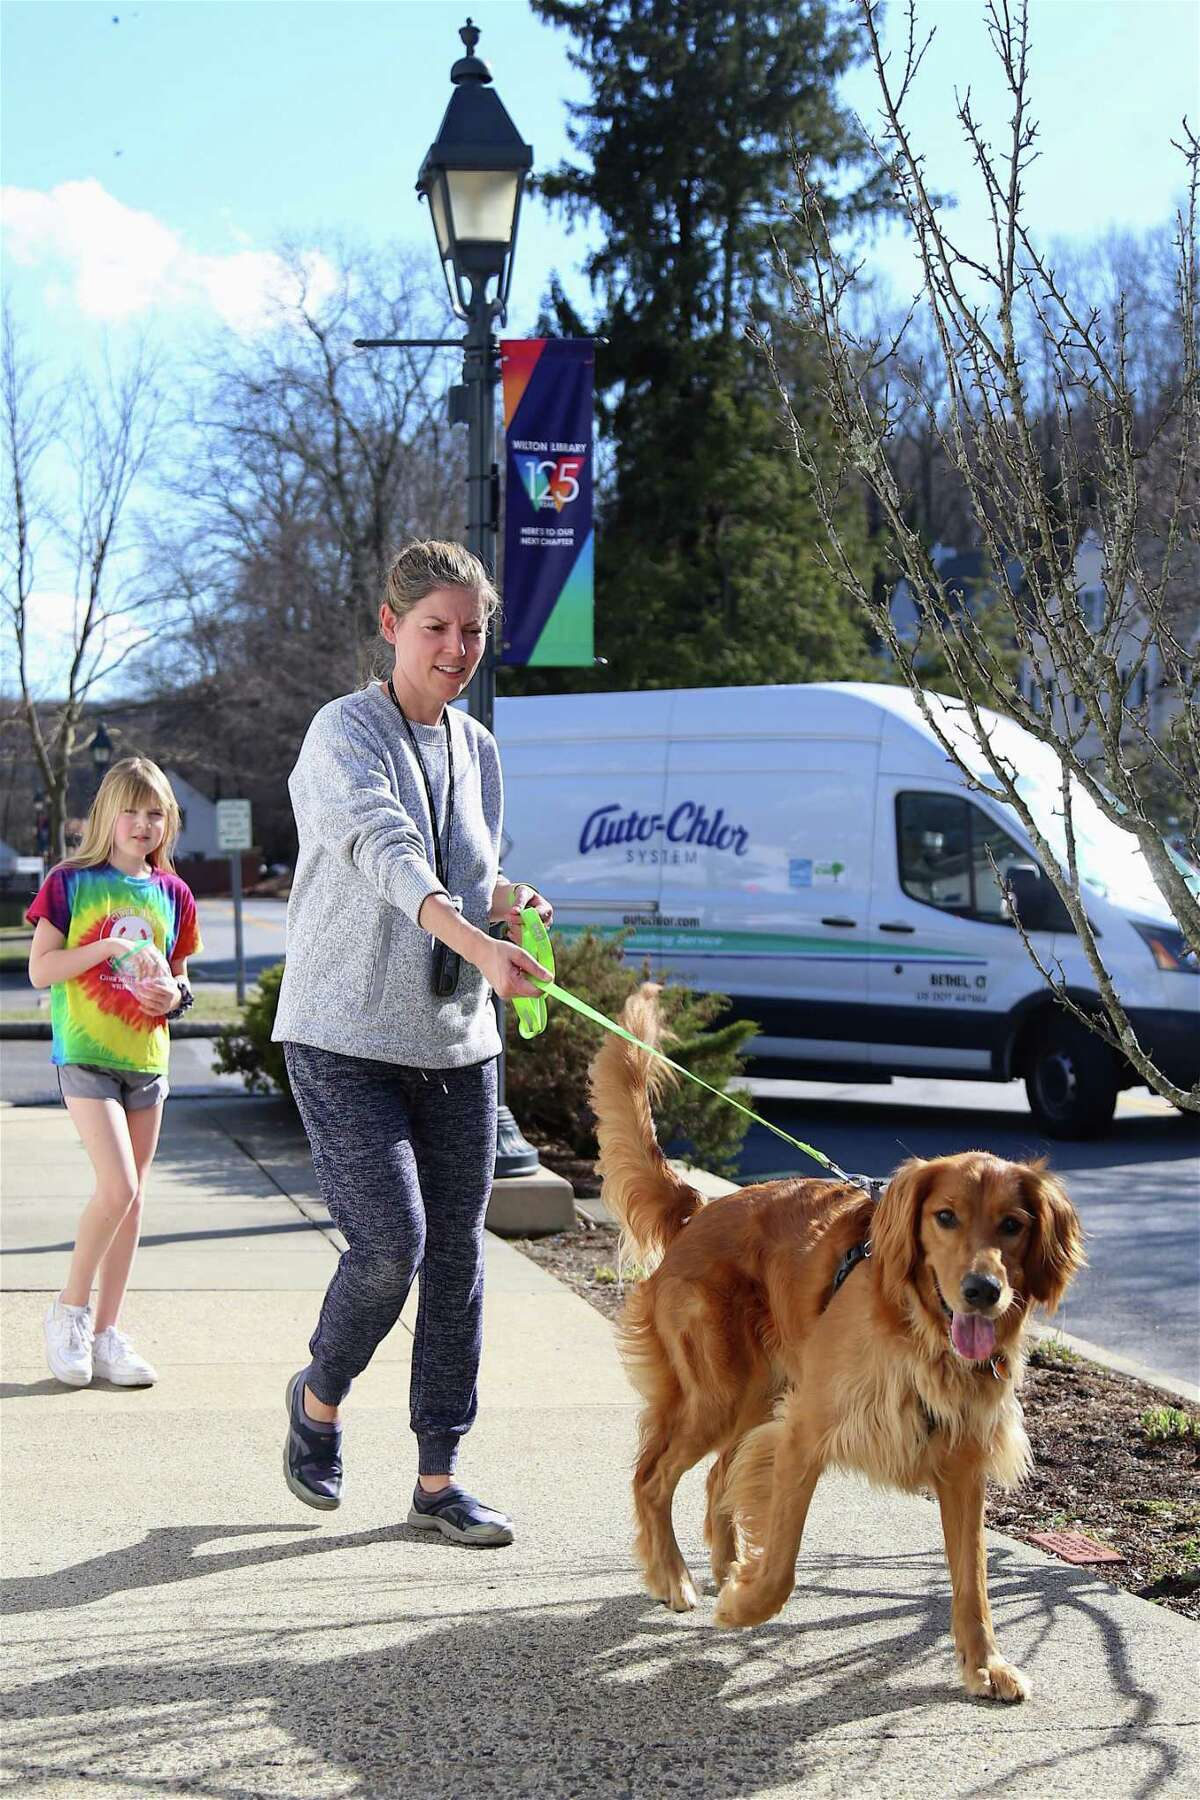 Juliet Craig of Wilton takes a short walk around the village with her daughter Natalie, 11, and their dog Chewie.